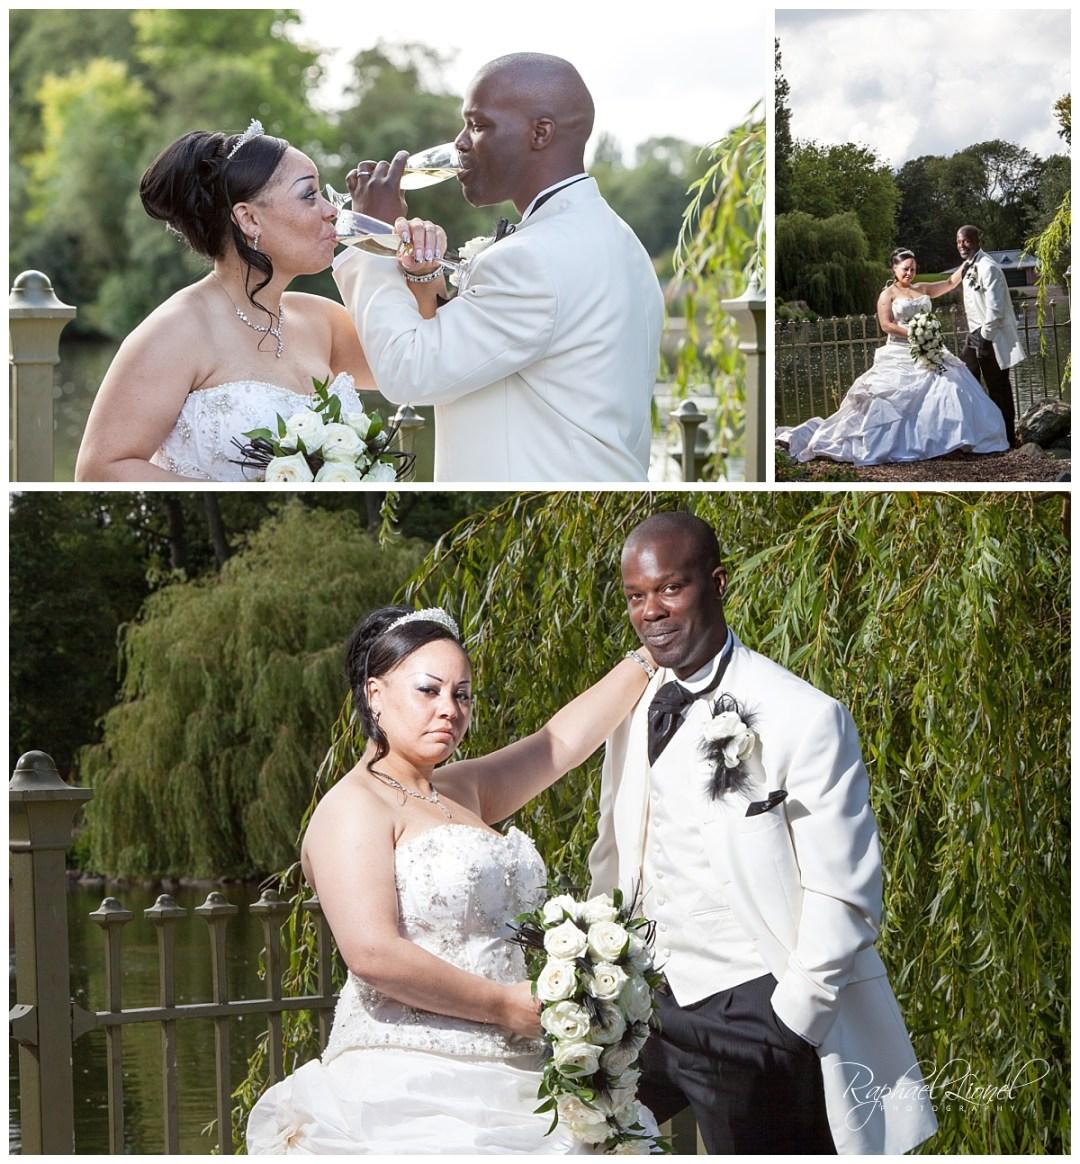 2018 04 08 0026 - City Wedding Birmingham | Dauntley and Simone